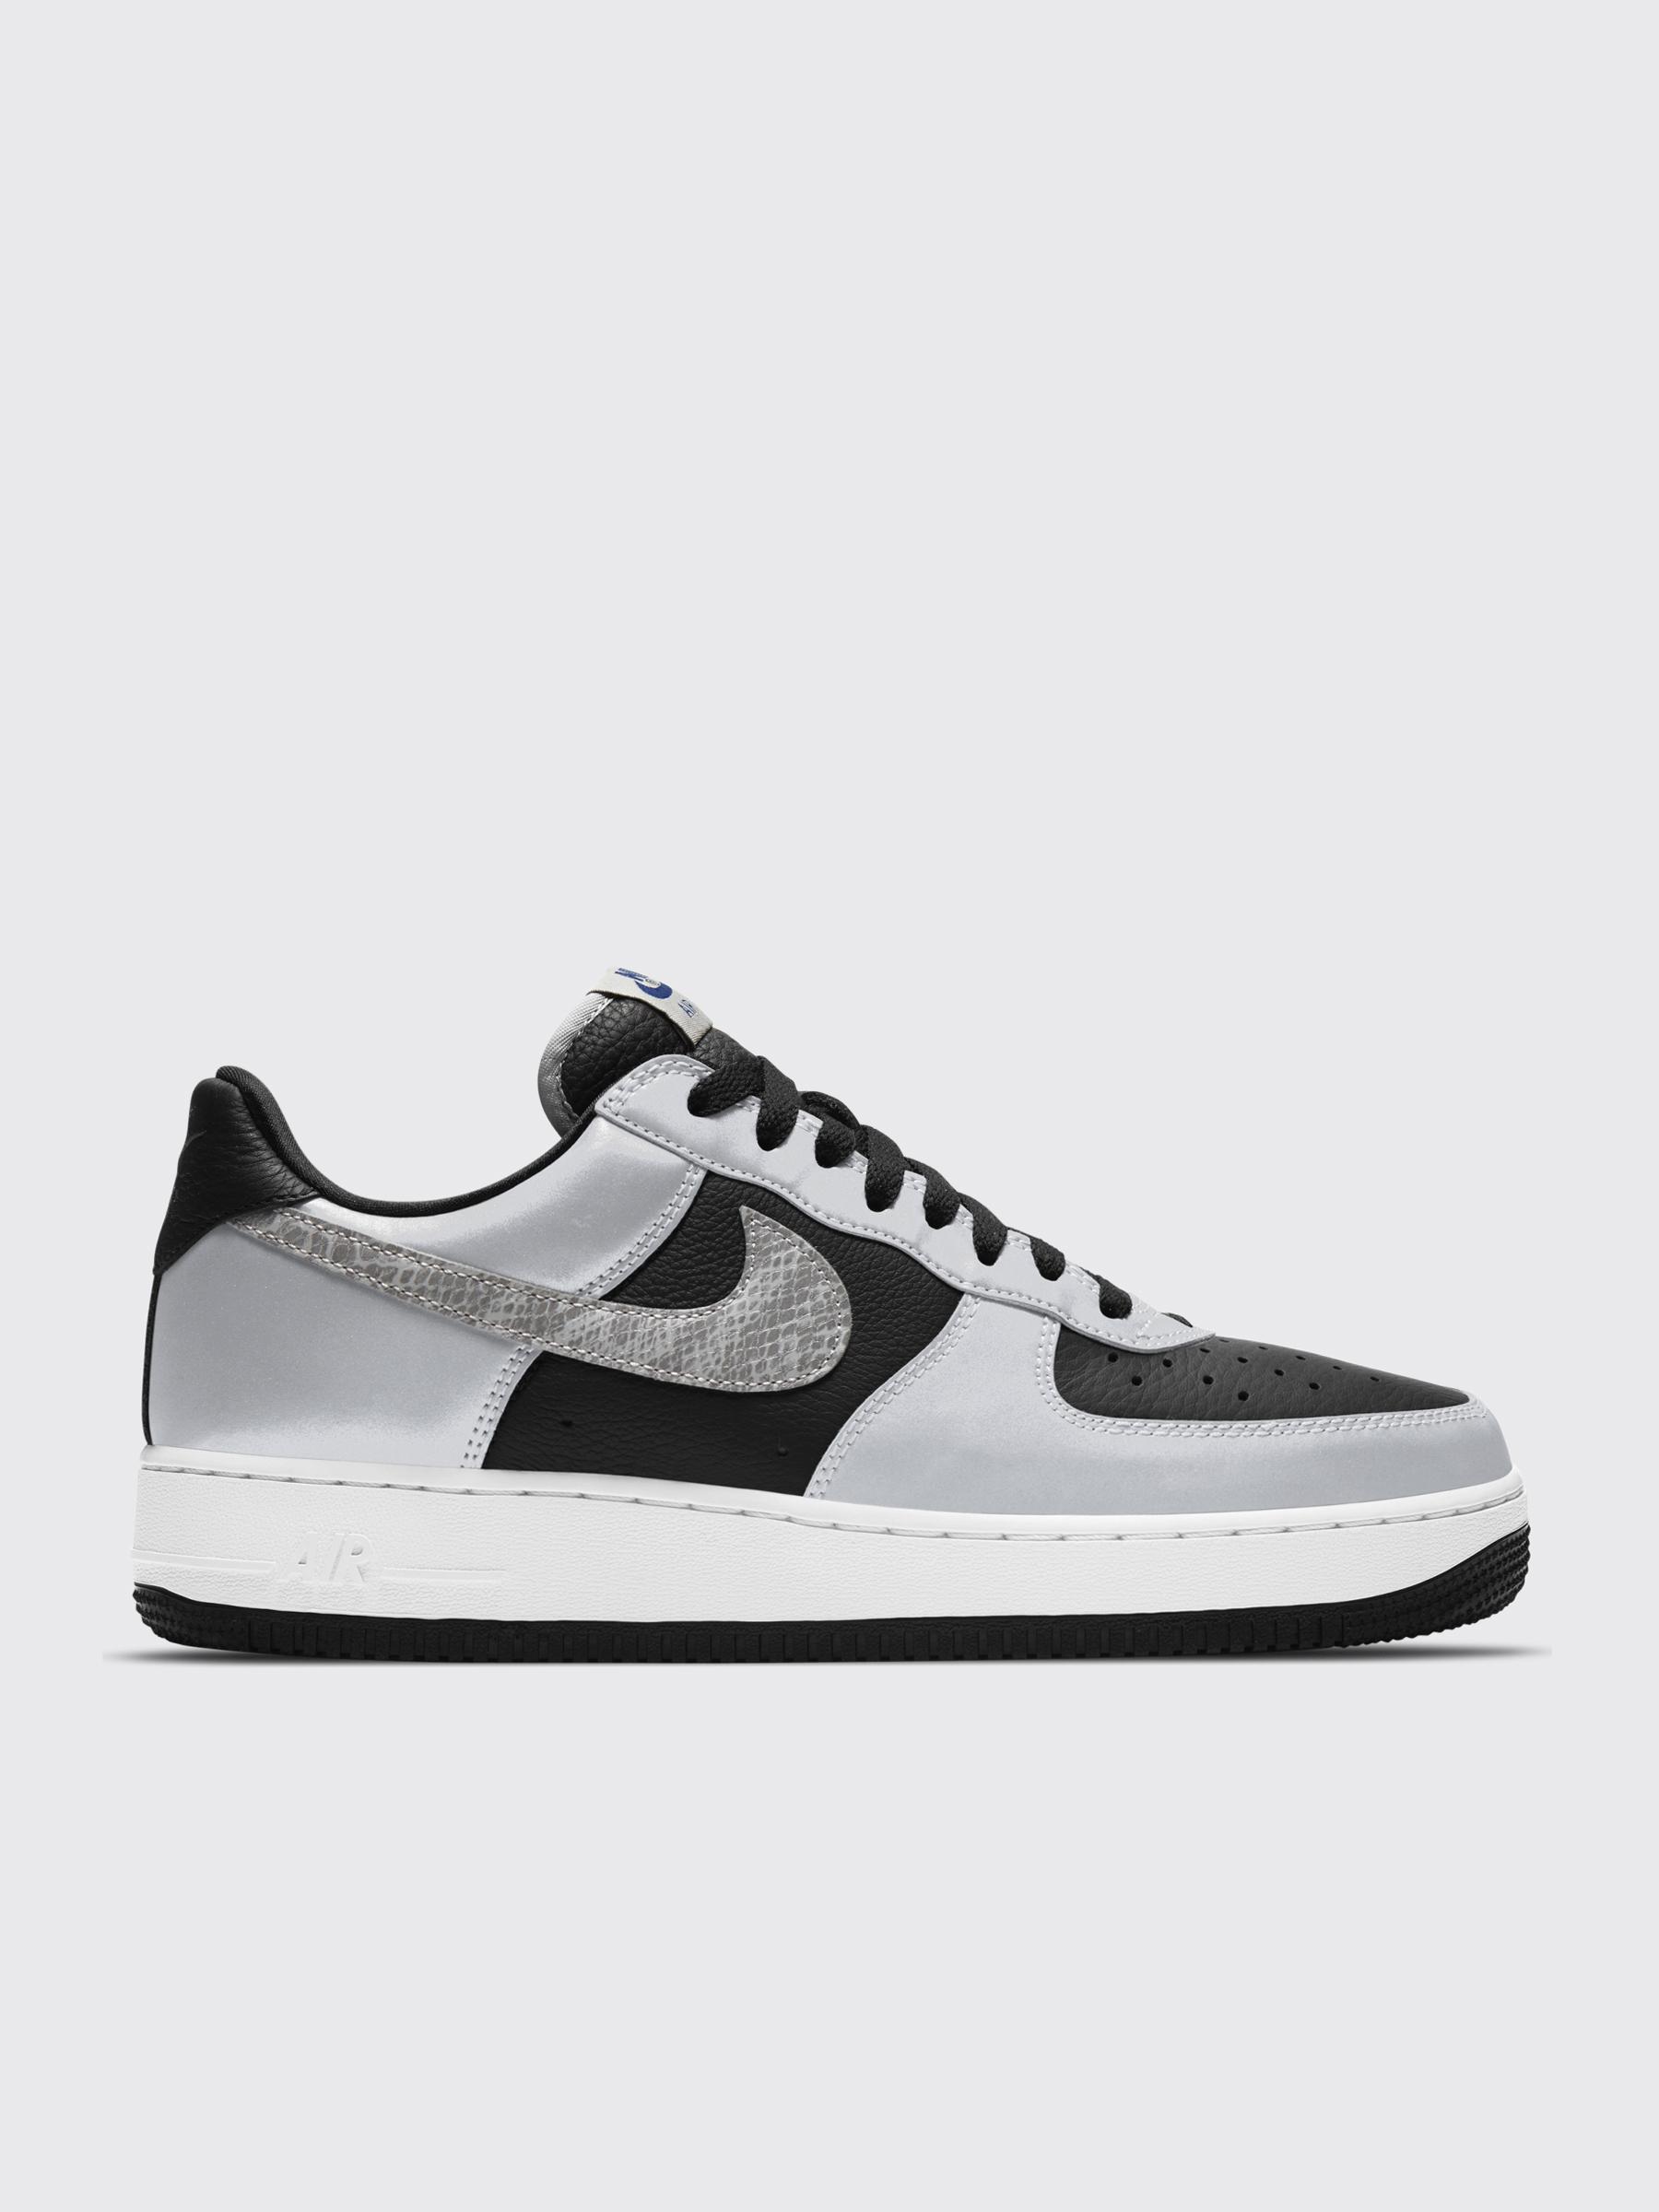 Très Bien - Nike Air Force 1 Low Black / Silver